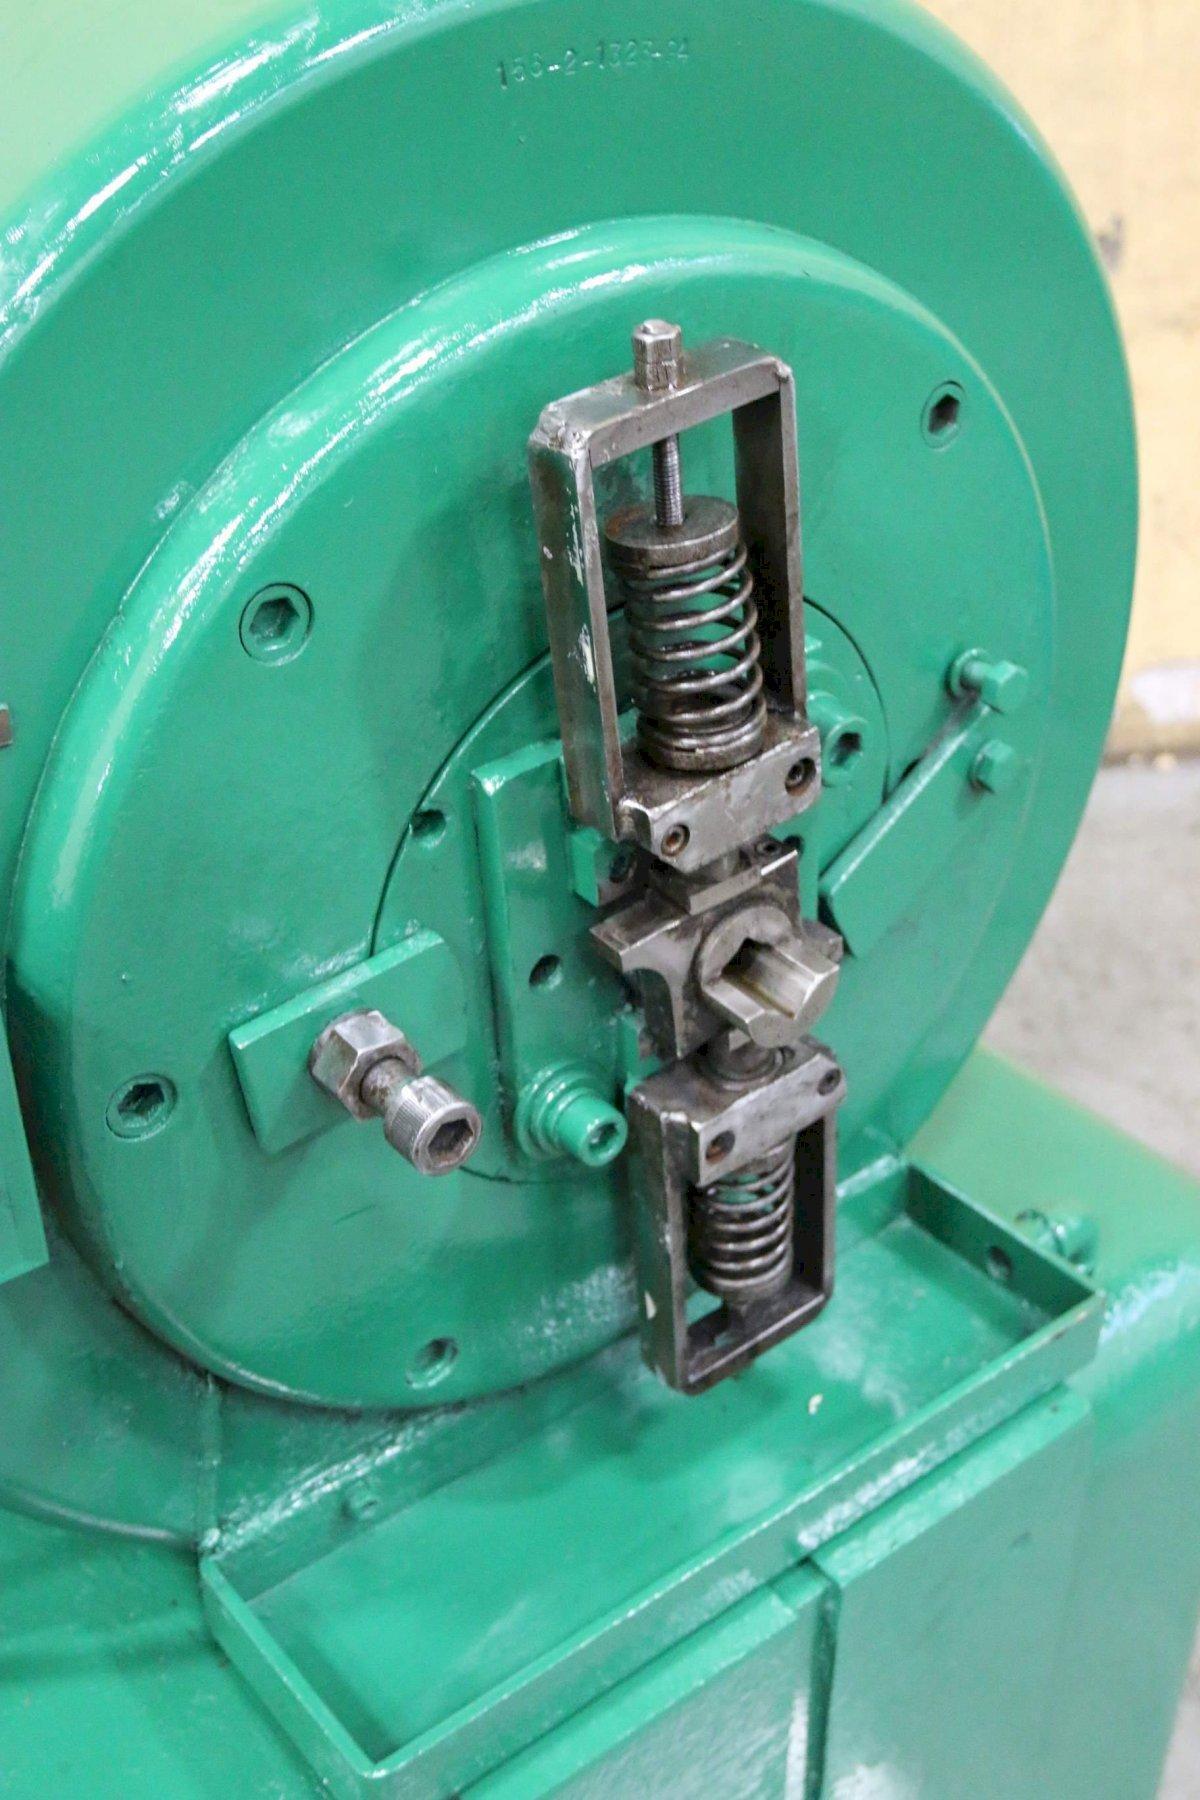 ETNA MODEL #150 SWAGER MACHINE: STOCK #68948